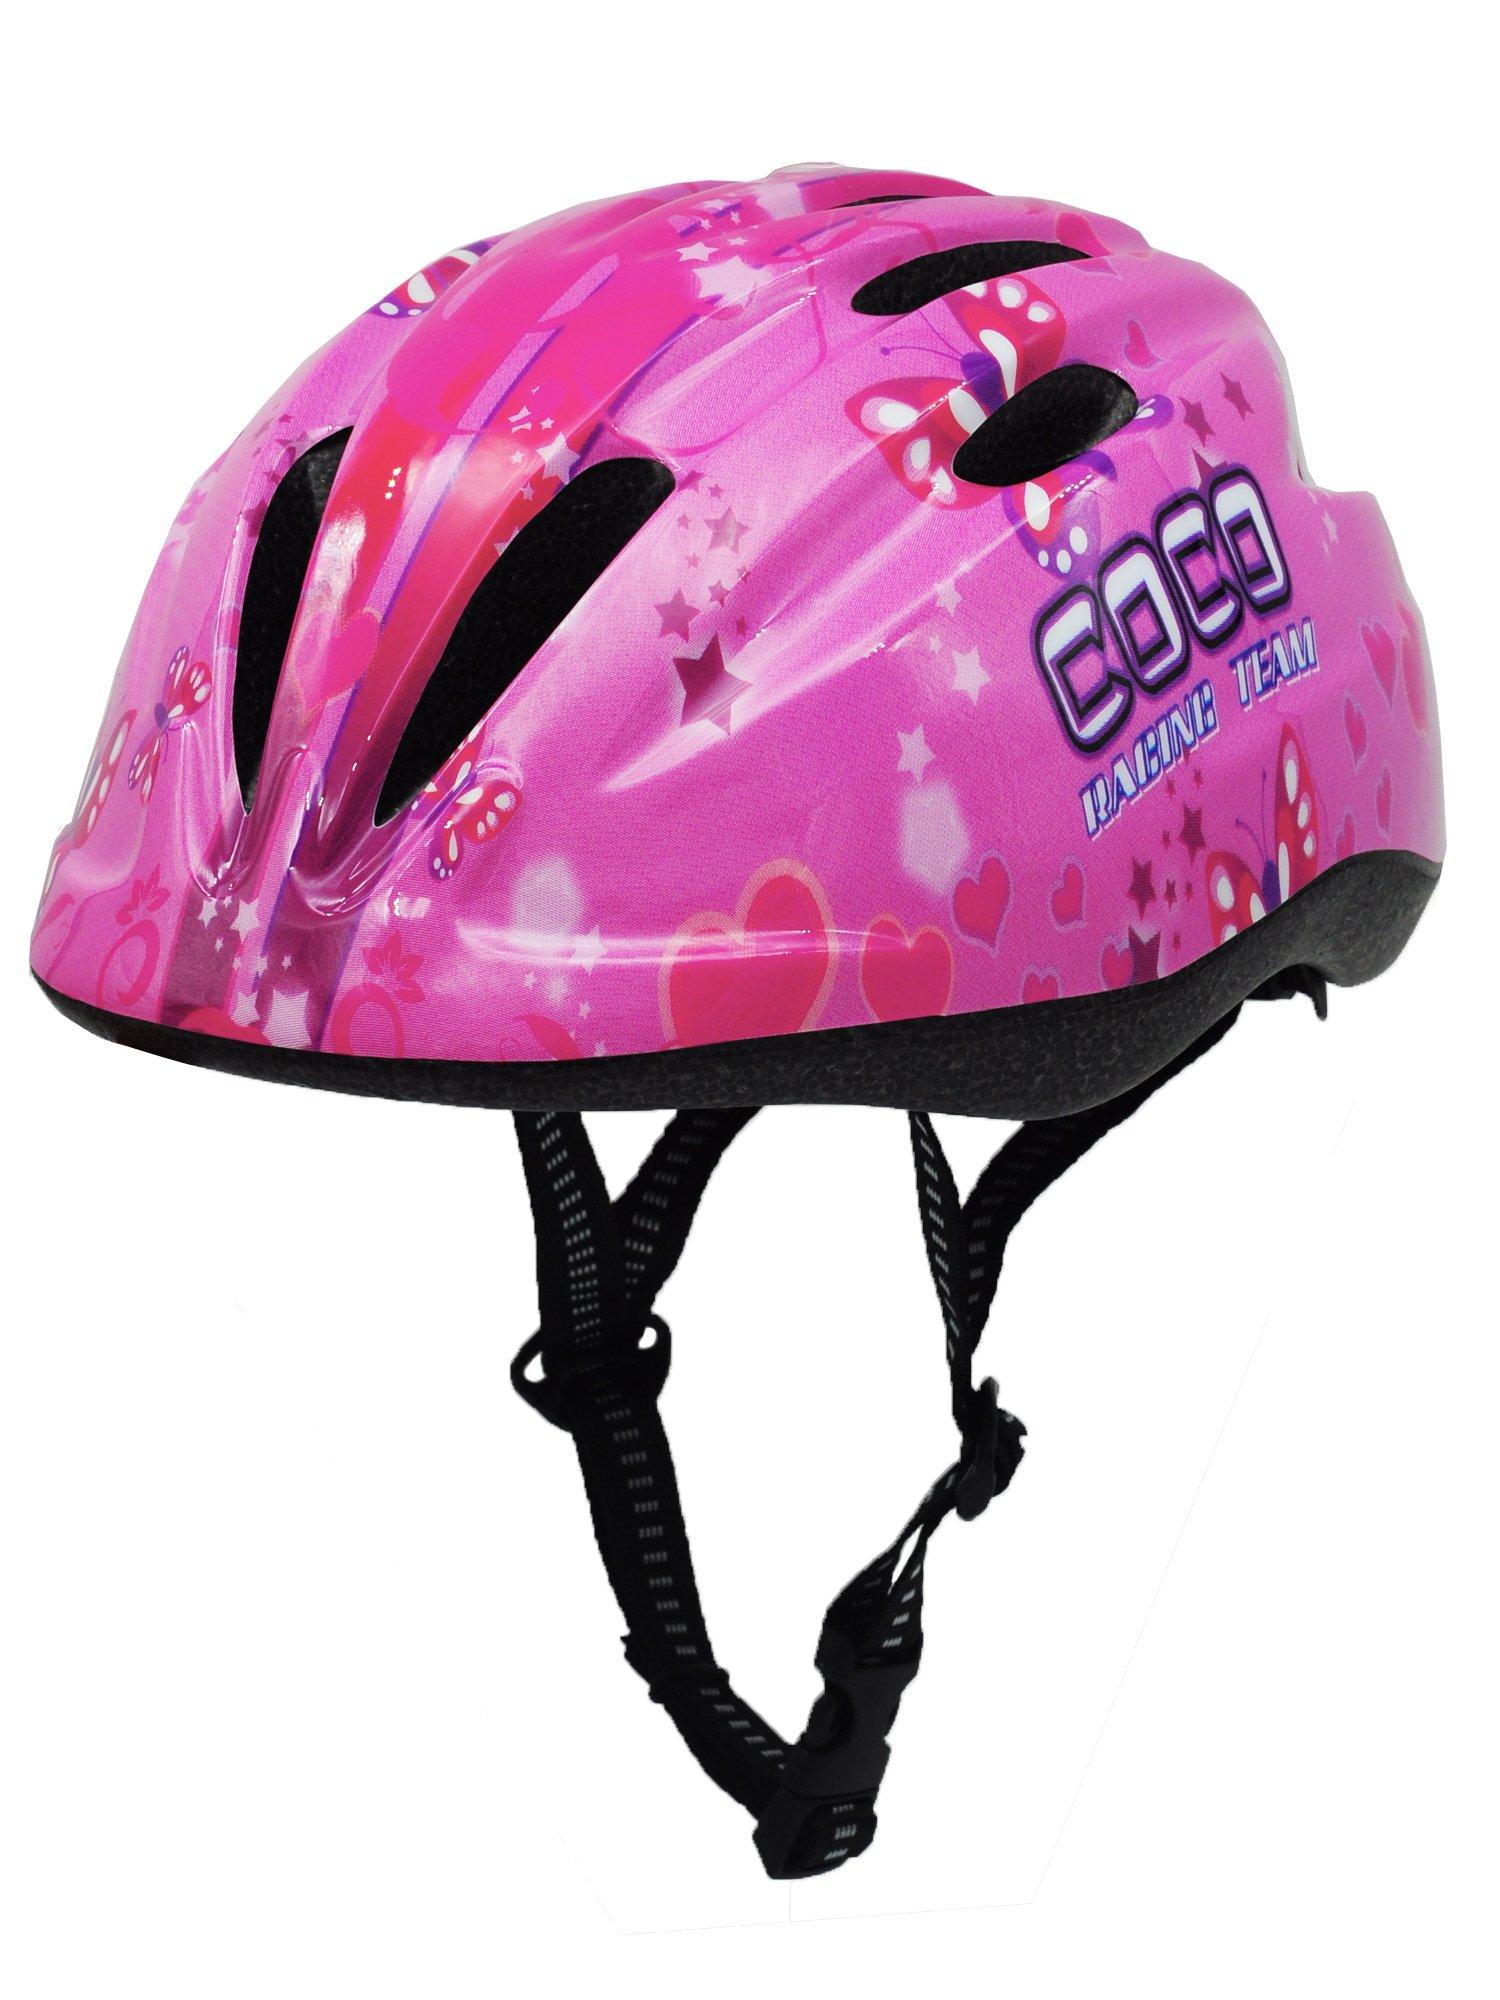 BeBeFun Pink Girl Toddler and Kids Multi-Sport Bike super lightweight Helmet (Violet)